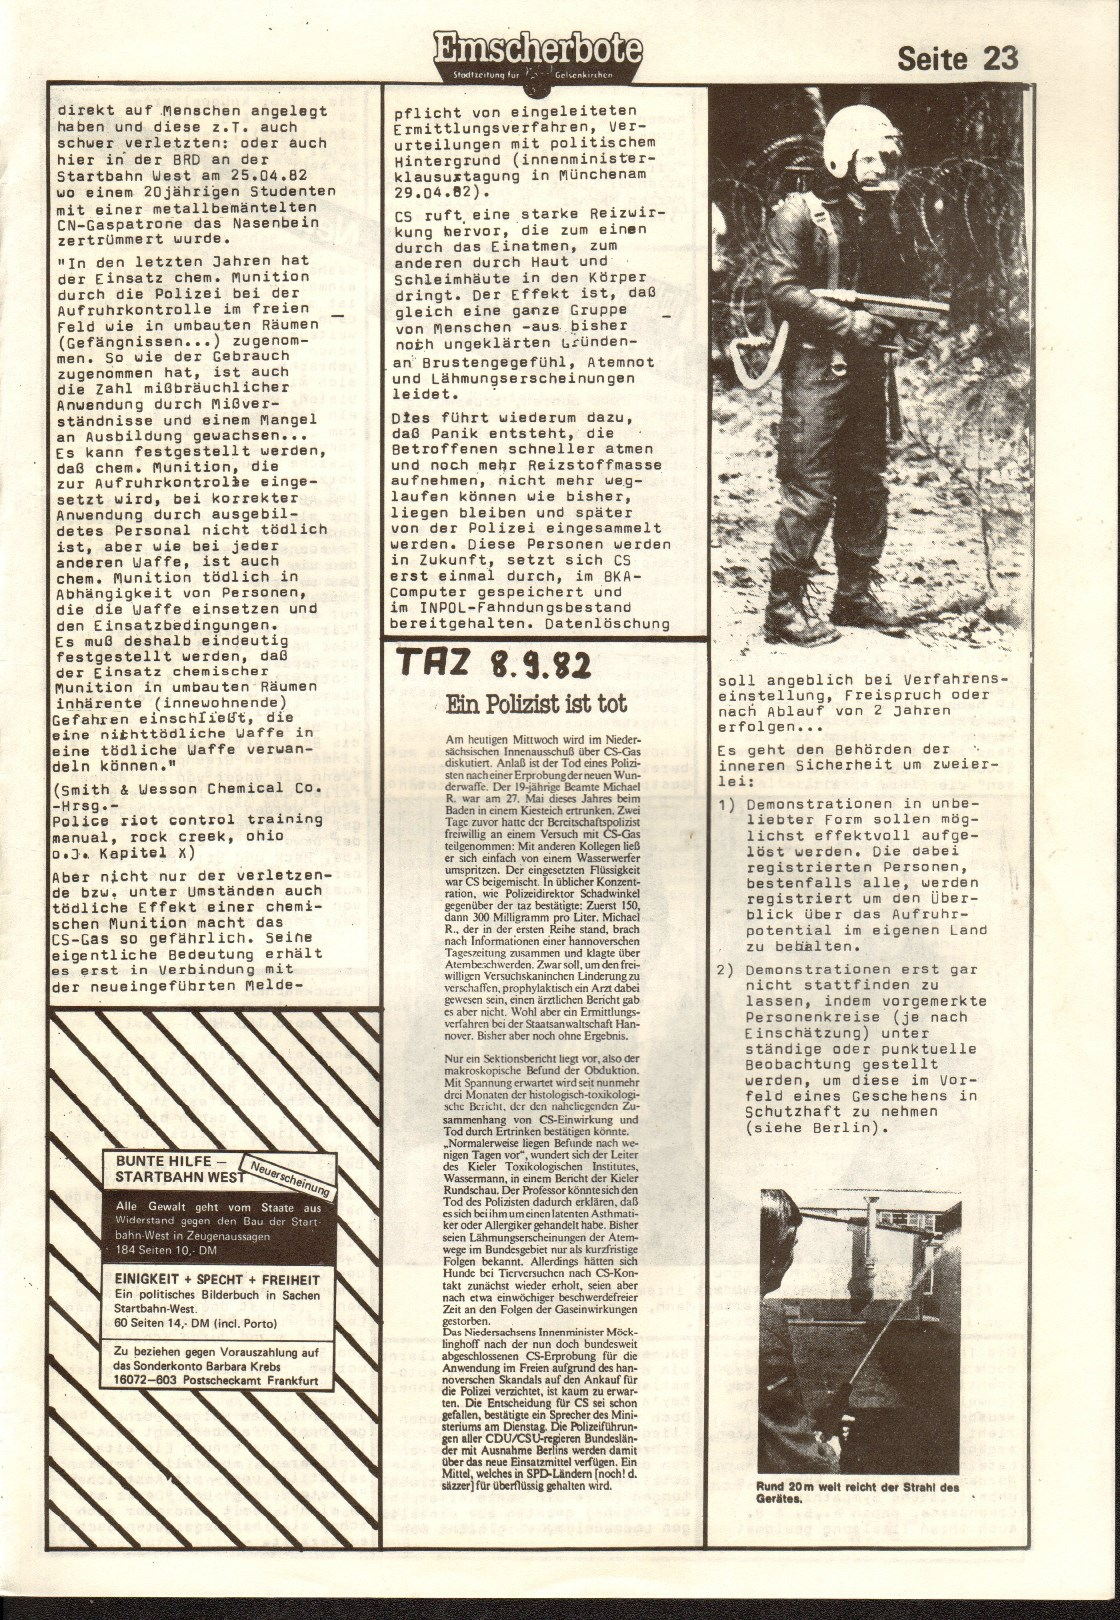 Gelsenkirchen_Emscherbote_1982_21_23